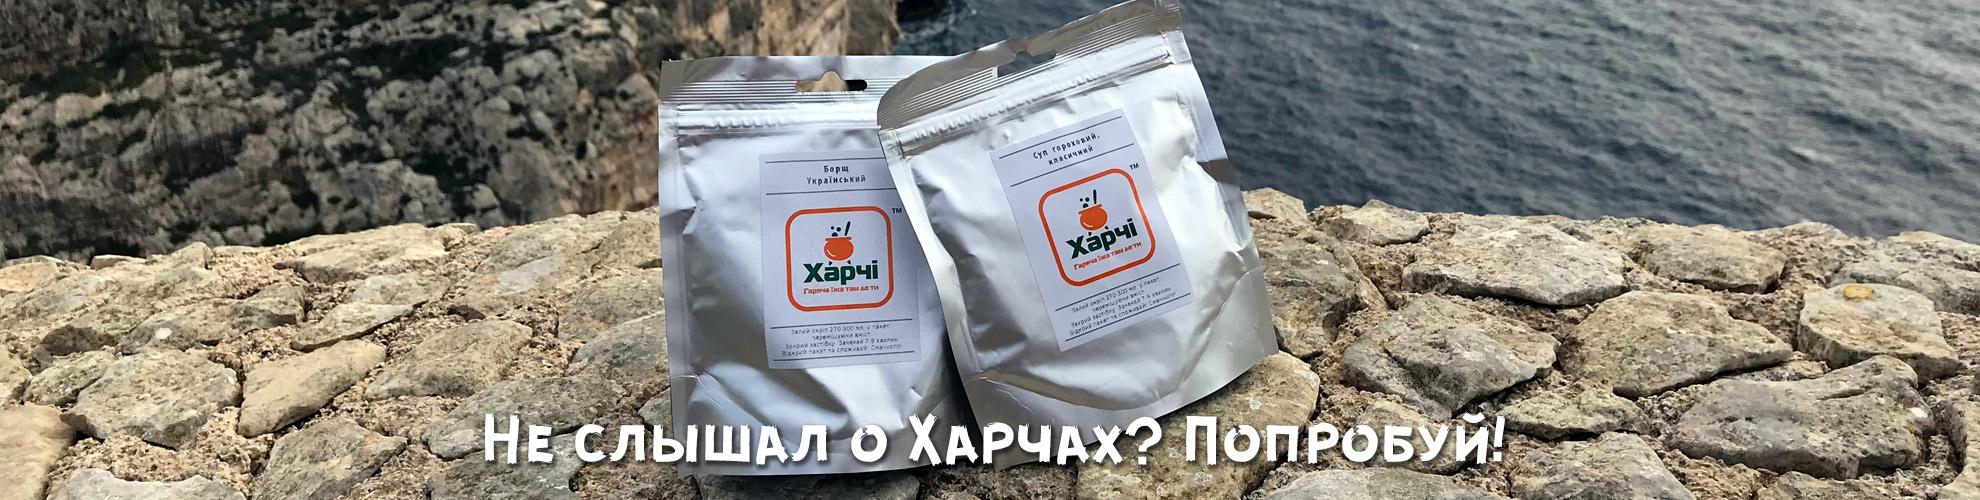 xarchi_ru